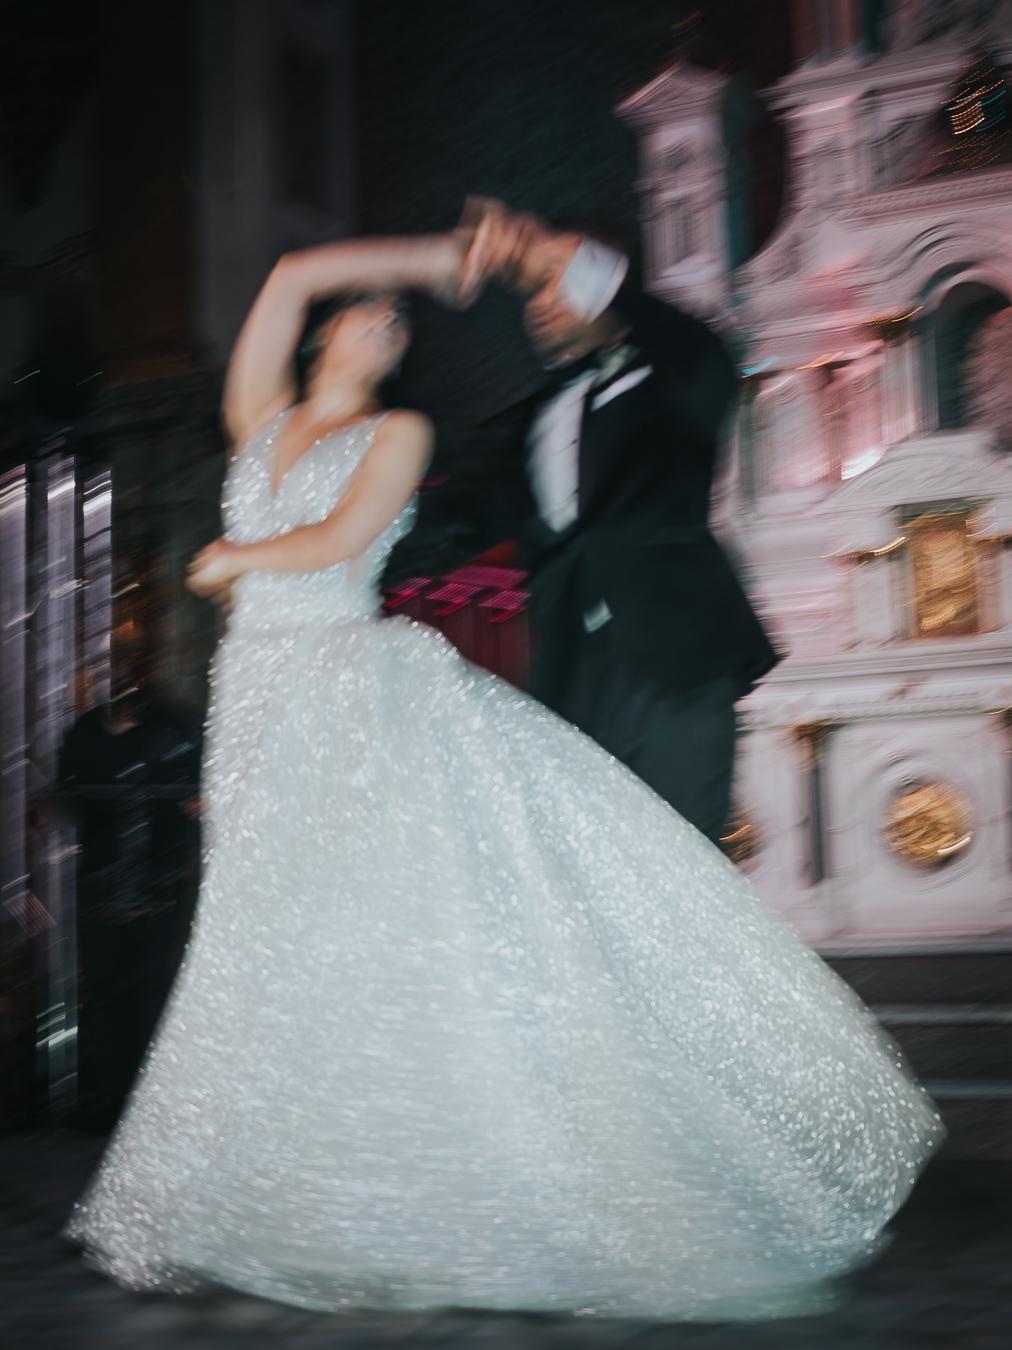 Slow shutter photo of couple twirling on dance floor by Joel & Justyna - Ottawa wedding photographers